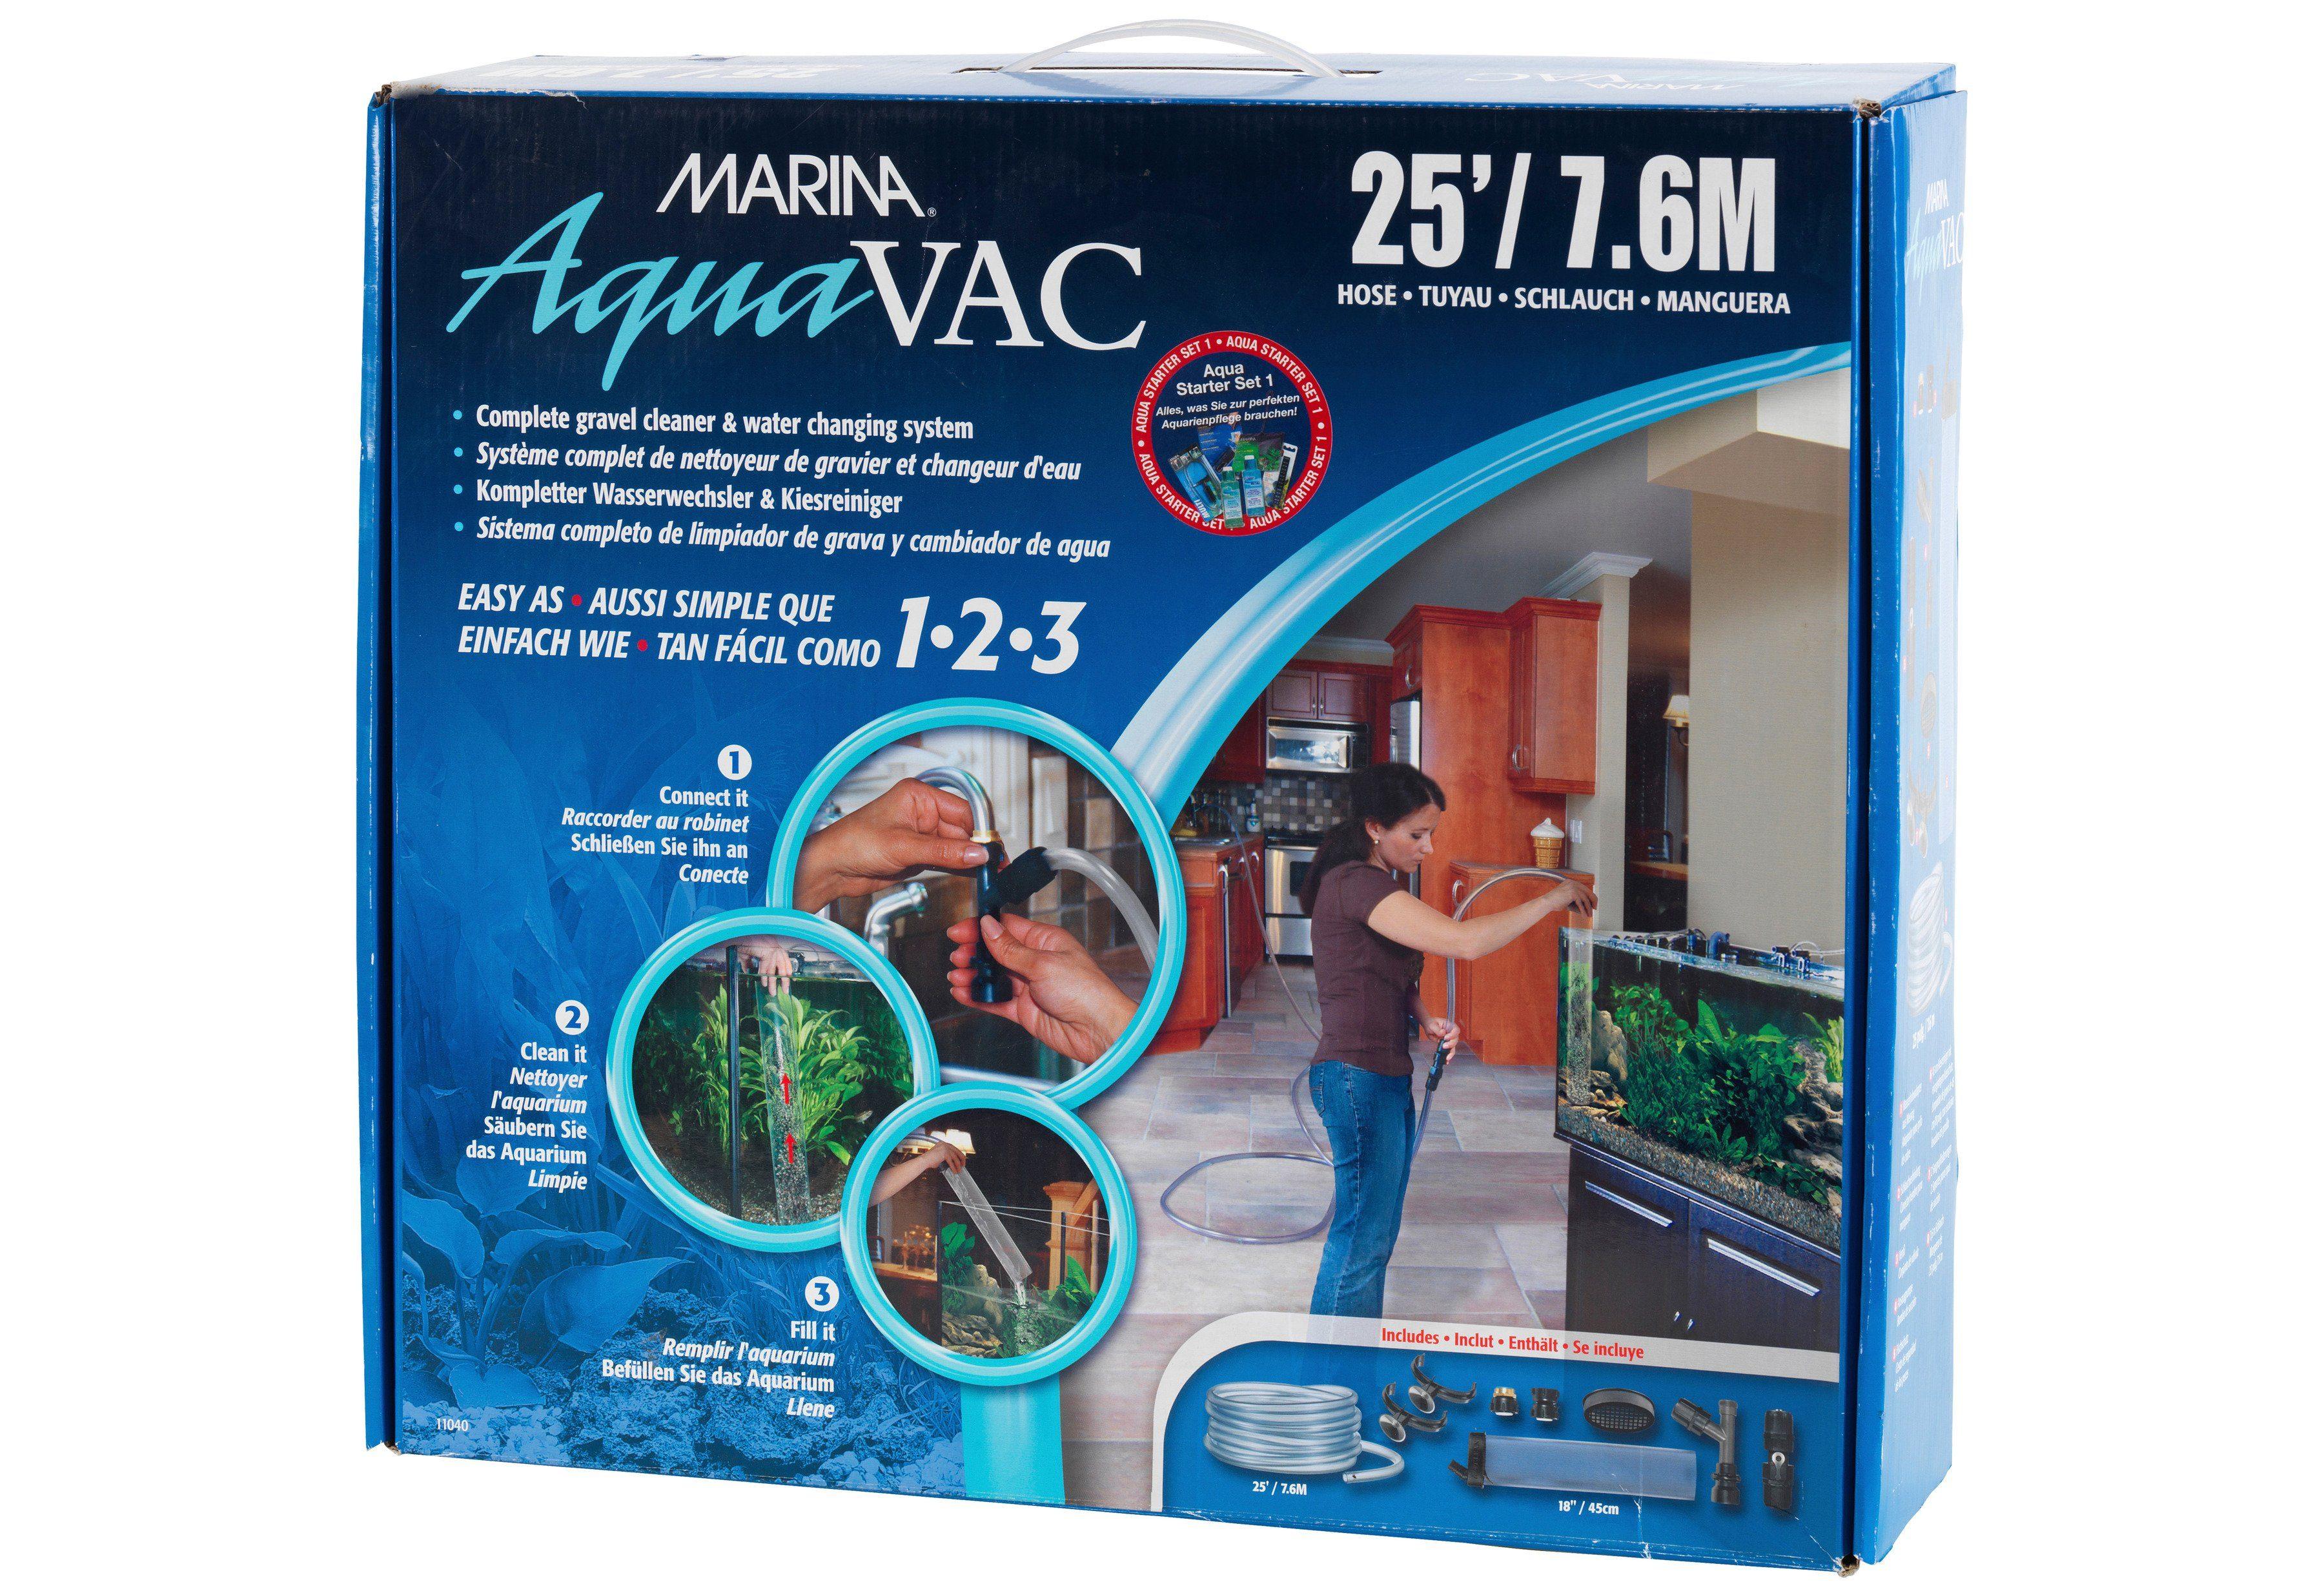 Aquariumpflege »Aqua Vac Starterpaket 1« (7,6 m)